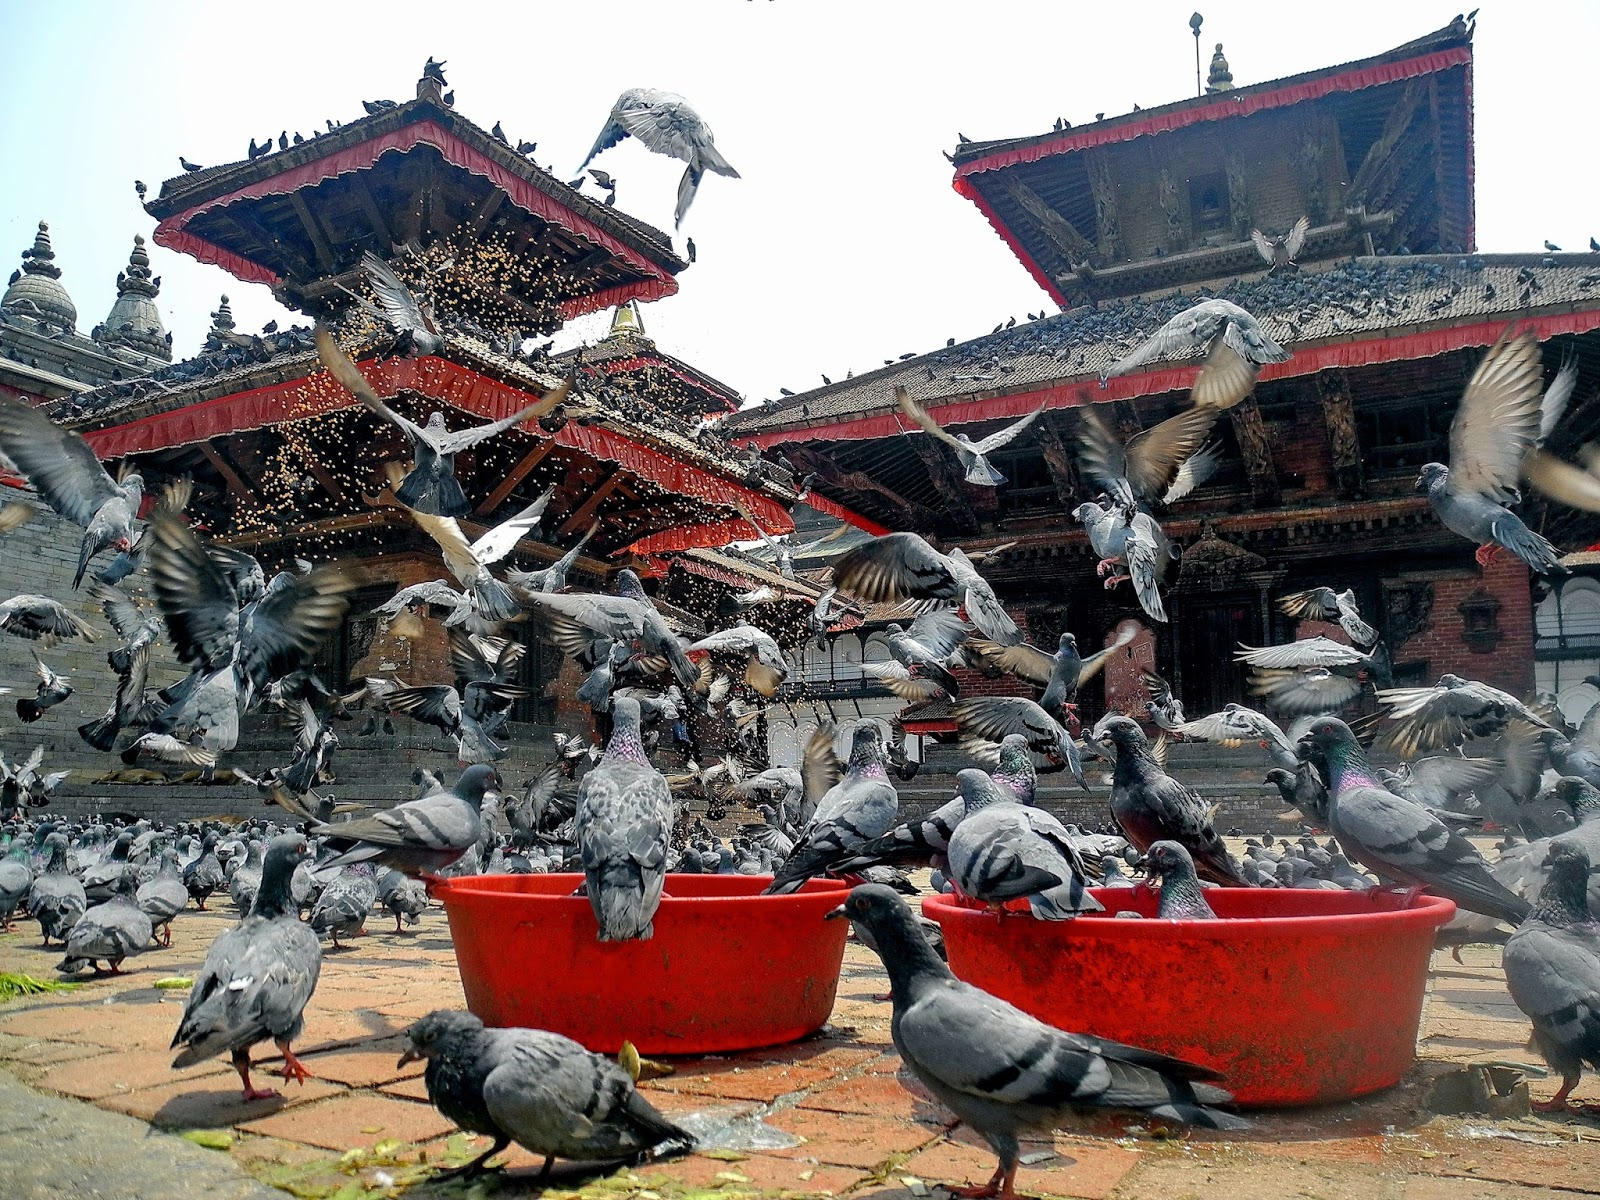 Flock of pigeons at a Kathmandu temple.